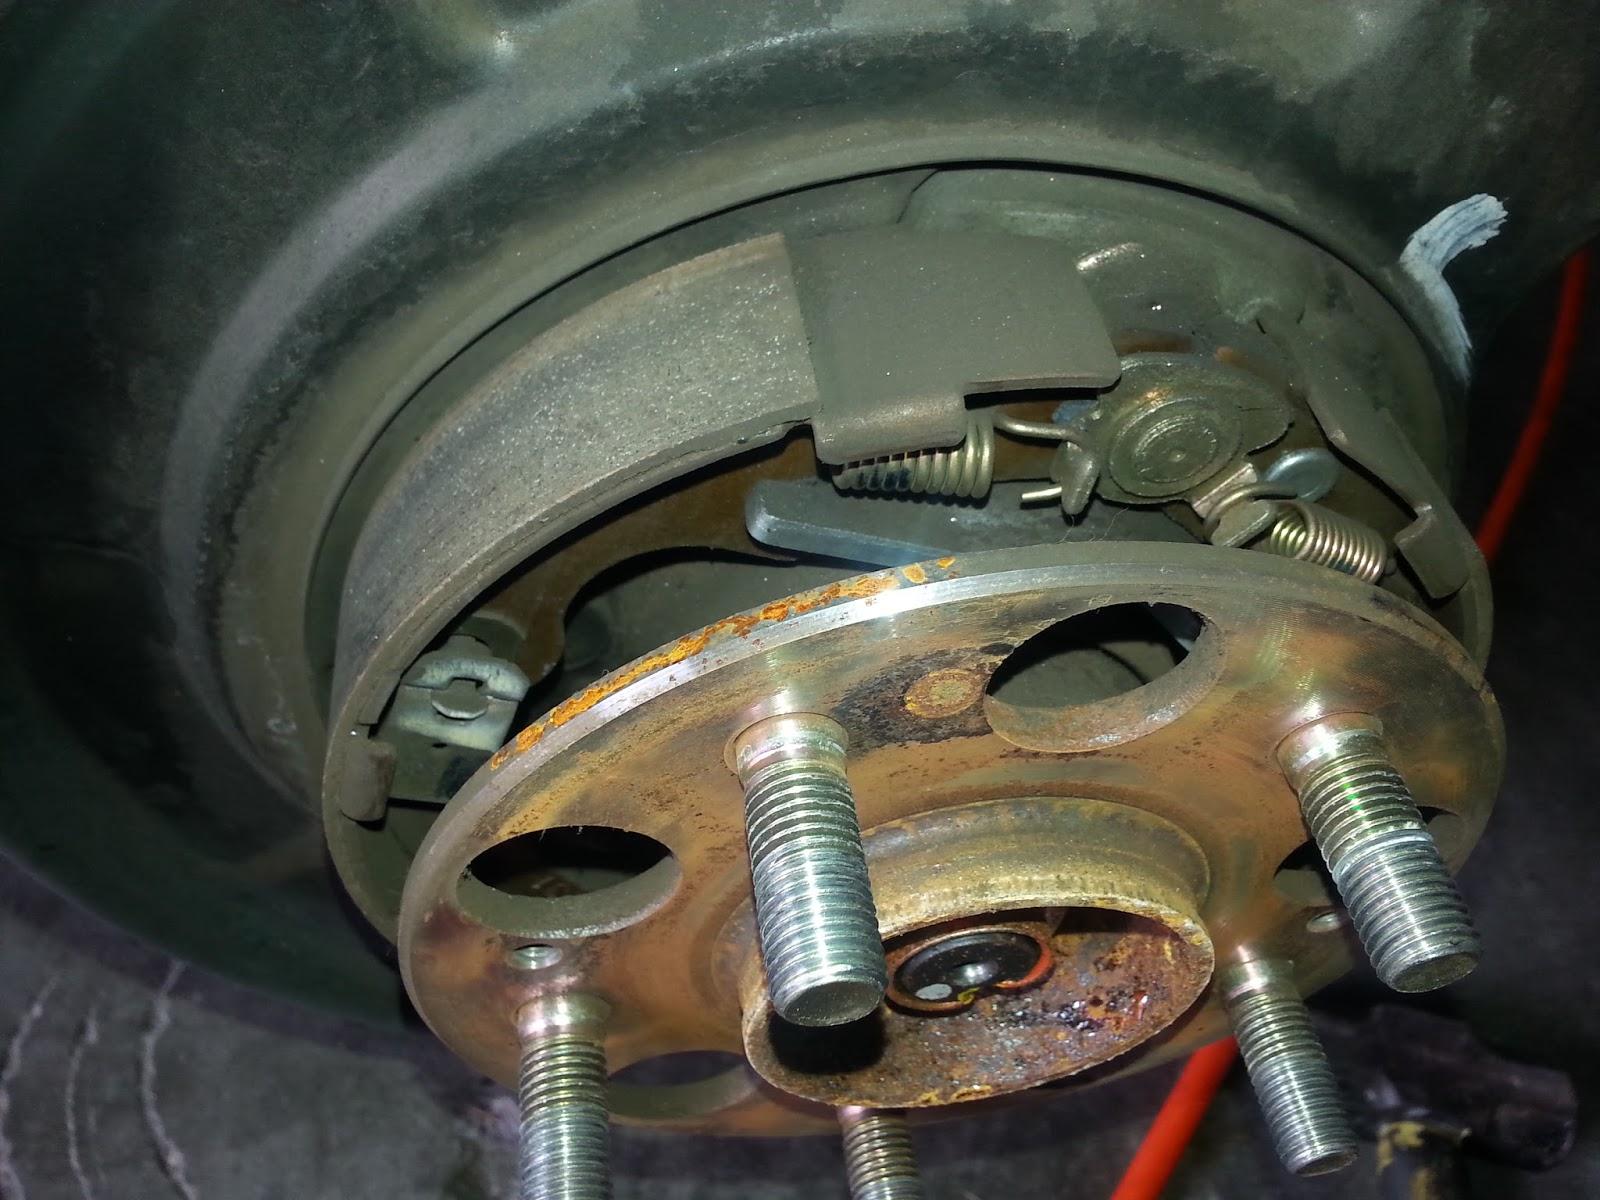 Corolla DIY: DIY Replace Rear Brakes and Rotors 2000 Honda CRV